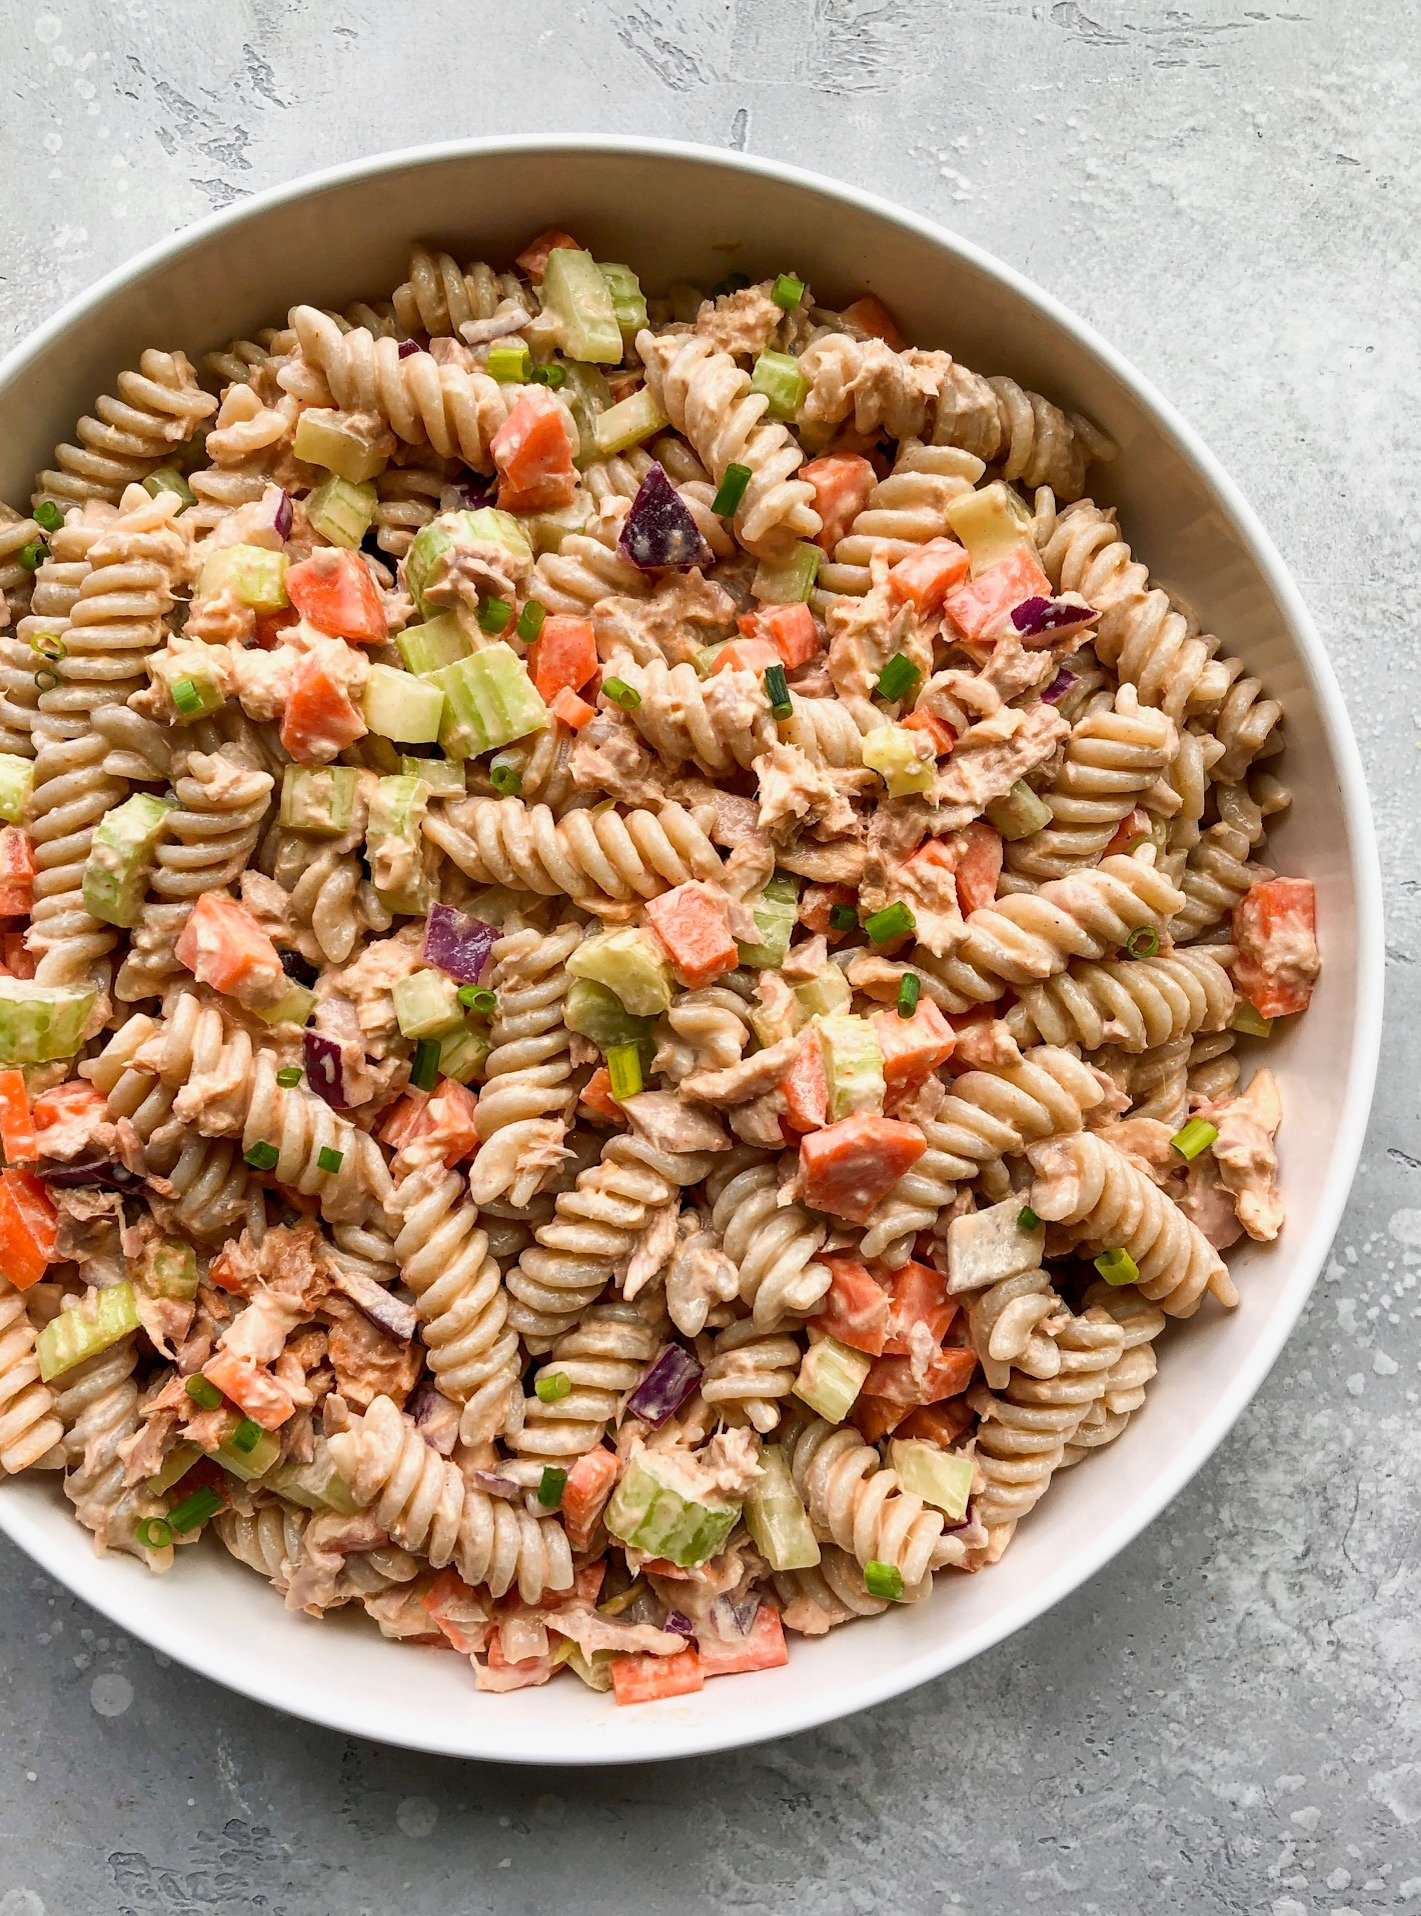 Buffalo tuna pasta salad